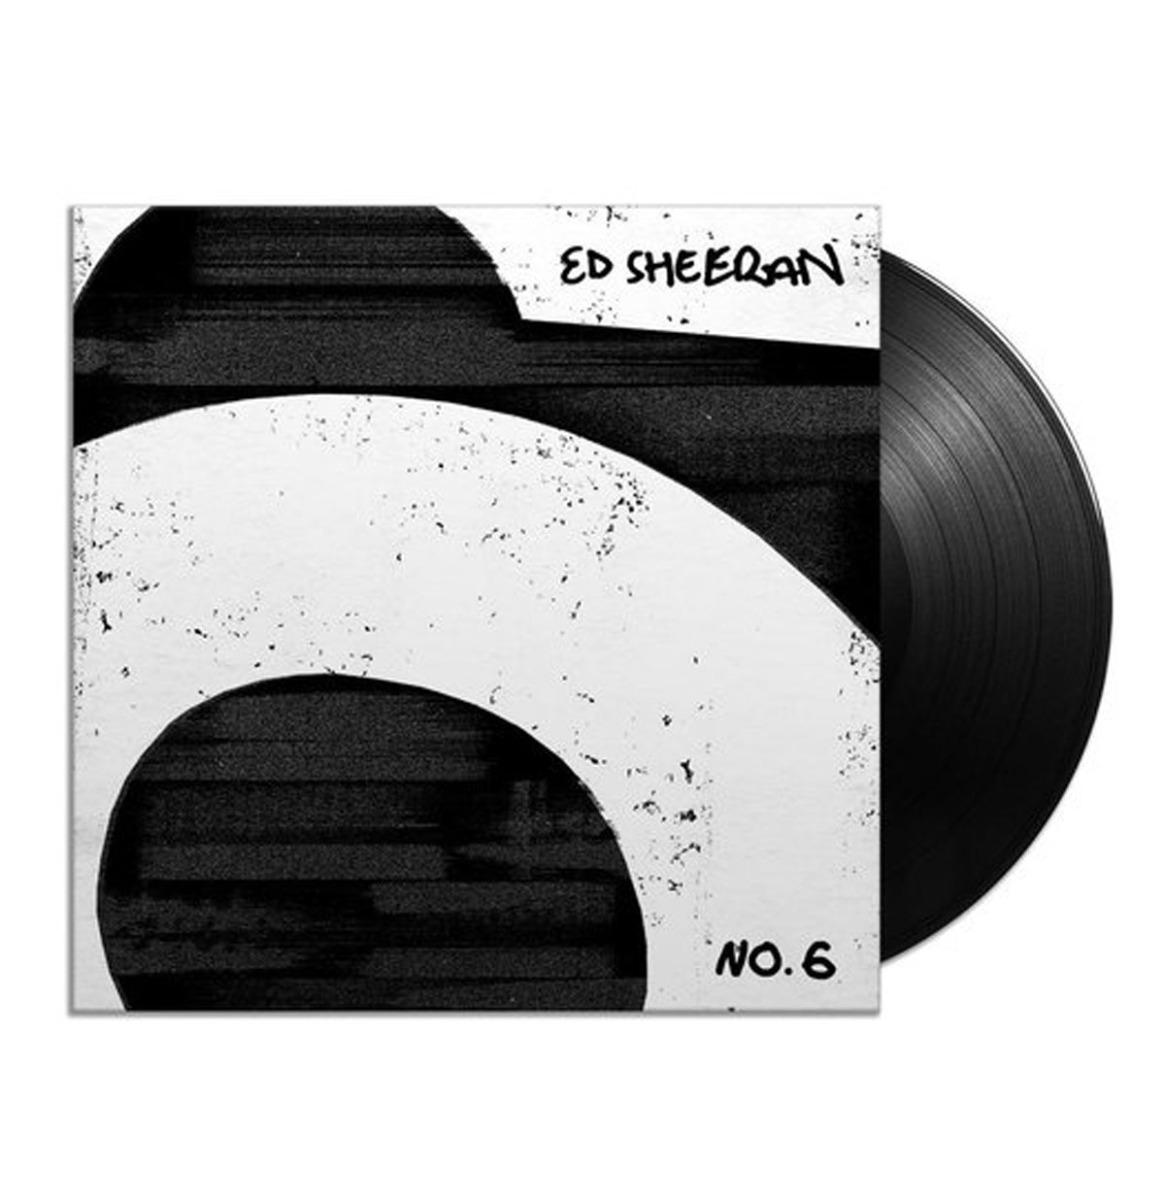 Ed Sheeran - No. 6 Collaborations Project 2-LP